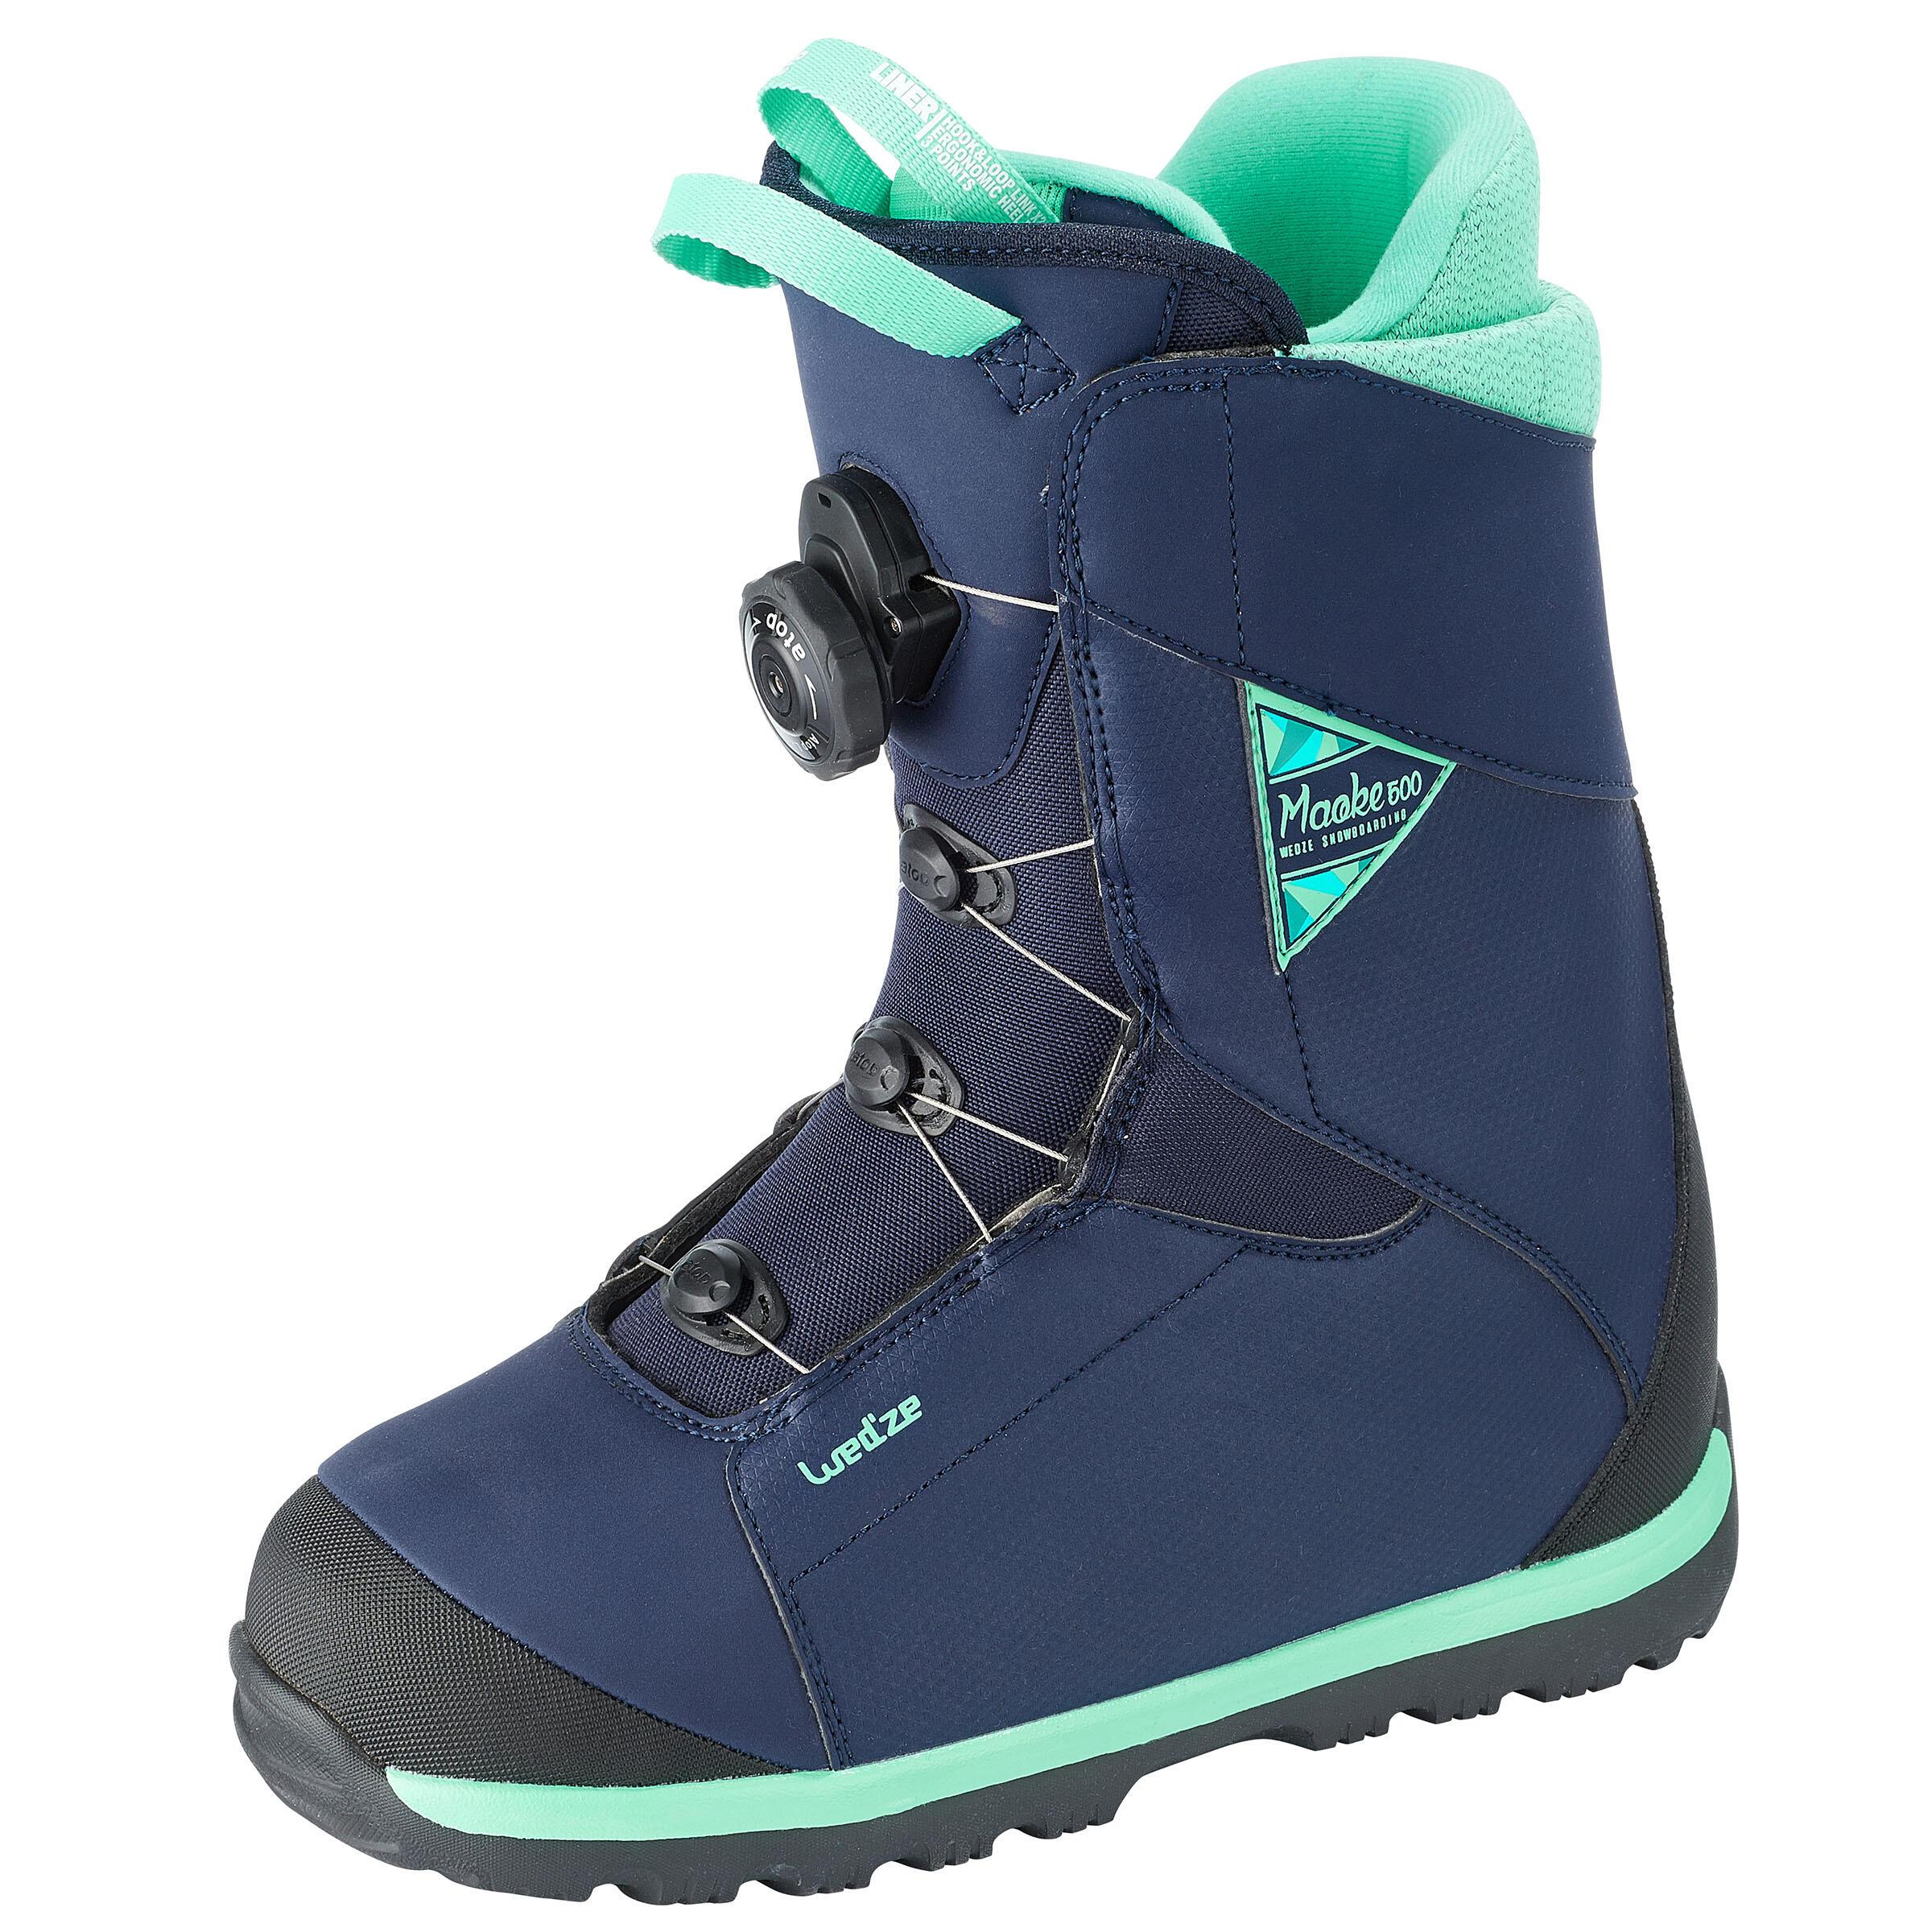 Wed'ze All mountain snowboardboots voor dames Maoke 500 - Cable Lock